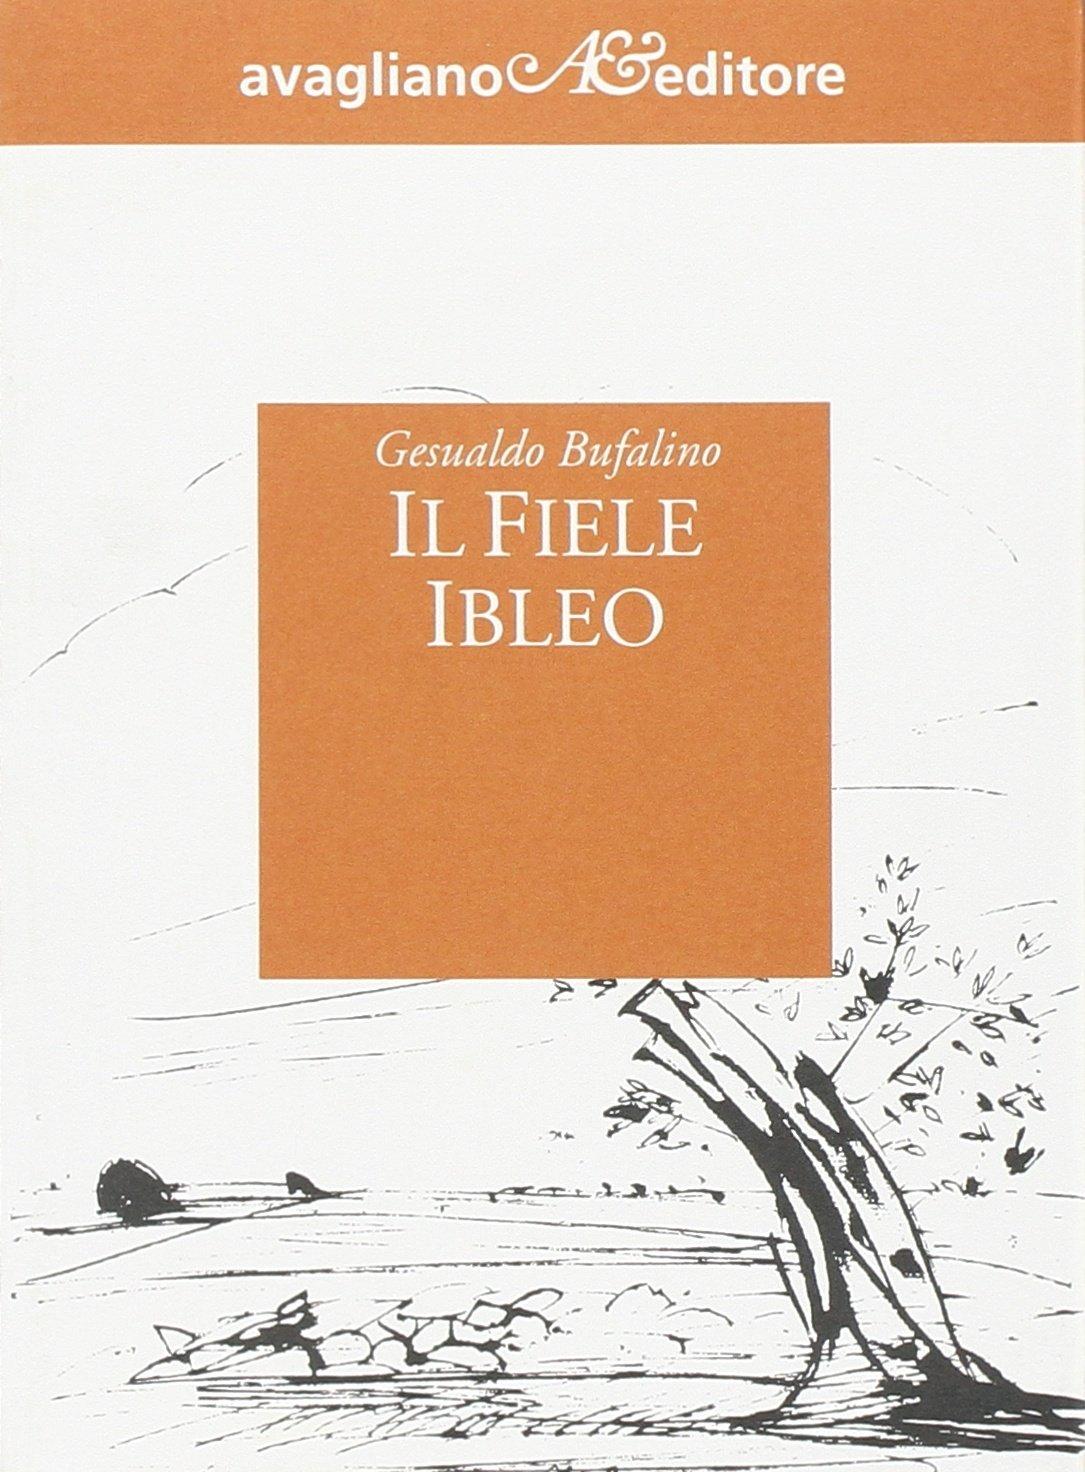 Amazon.it: Il fiele ibleo - Bufalino, Gesualdo - Libri